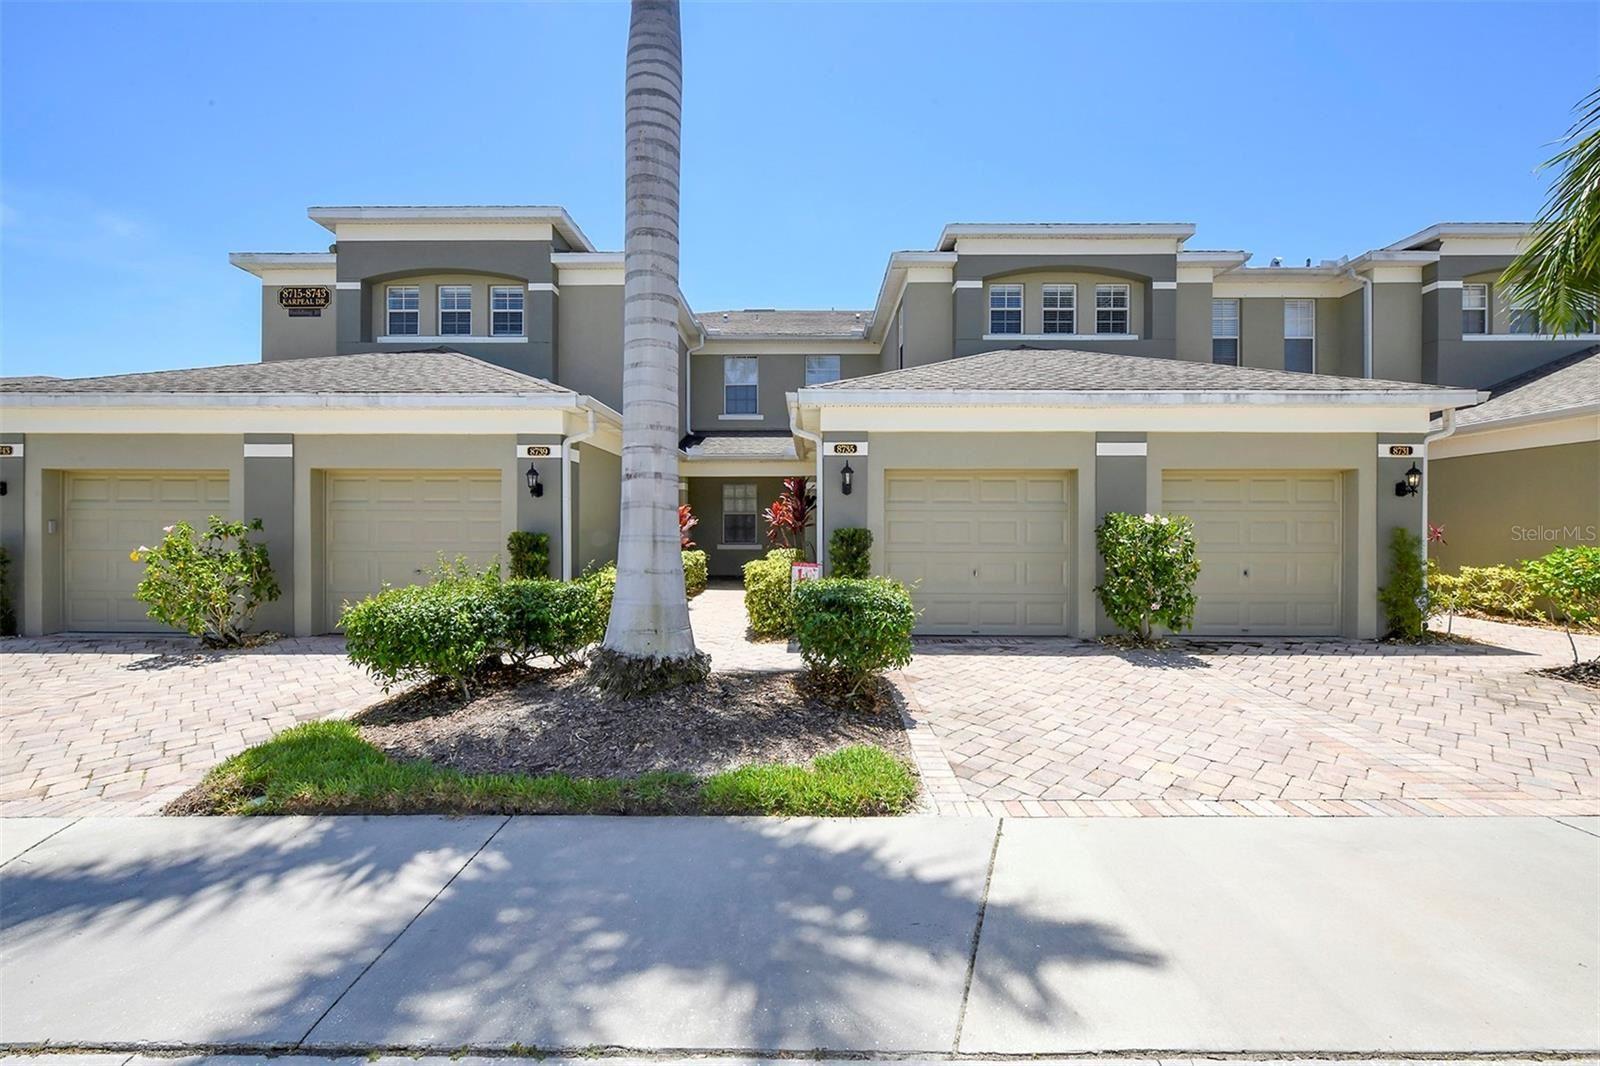 8735 KARPEAL DRIVE #1003, Sarasota, FL 34238 - #: A4508574